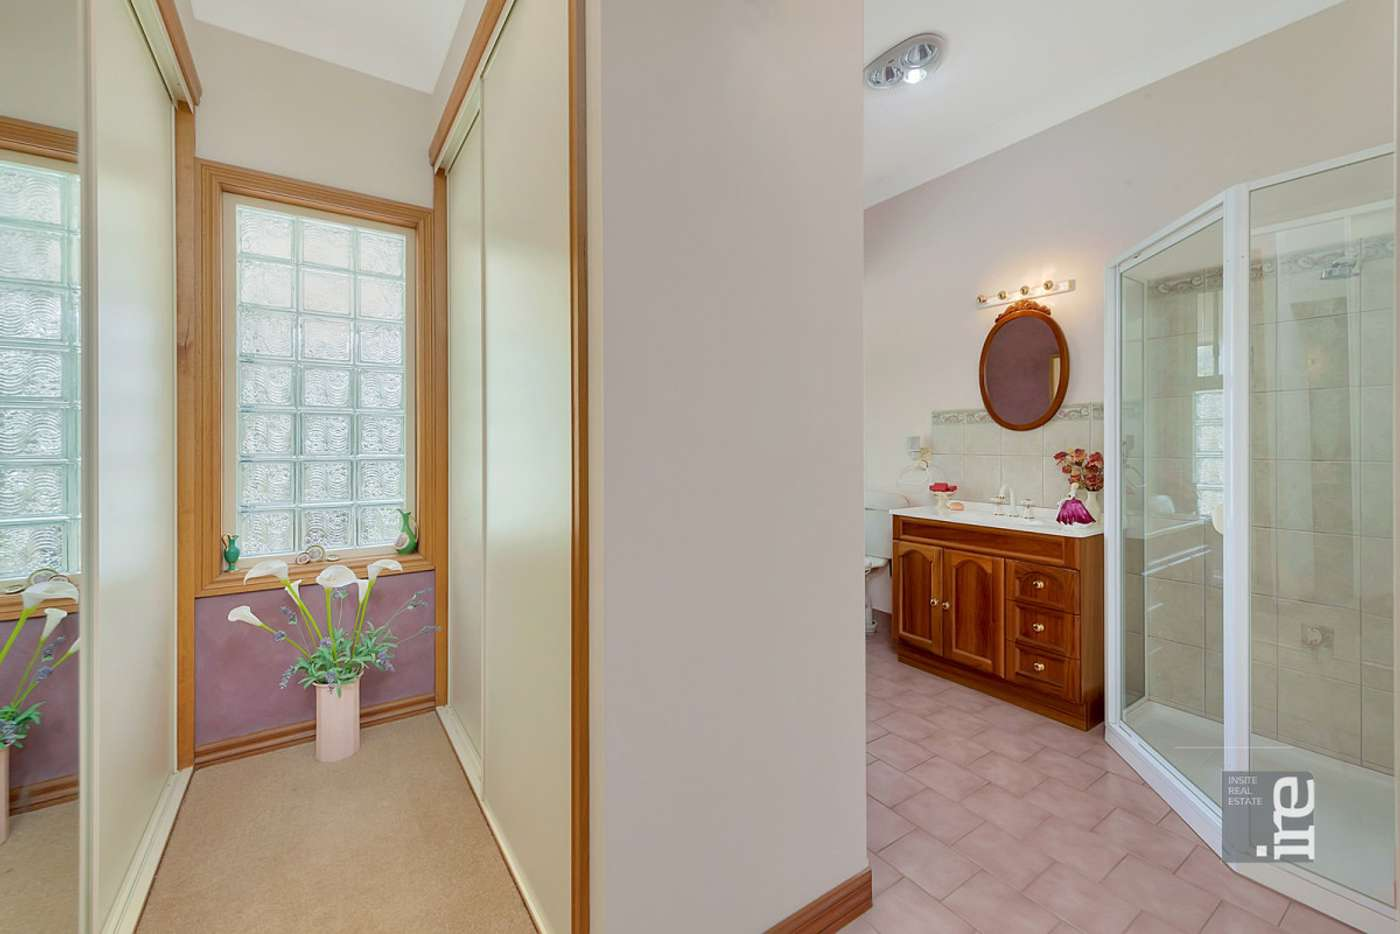 Seventh view of Homely house listing, 9 Brewer Lane, Eldorado VIC 3746